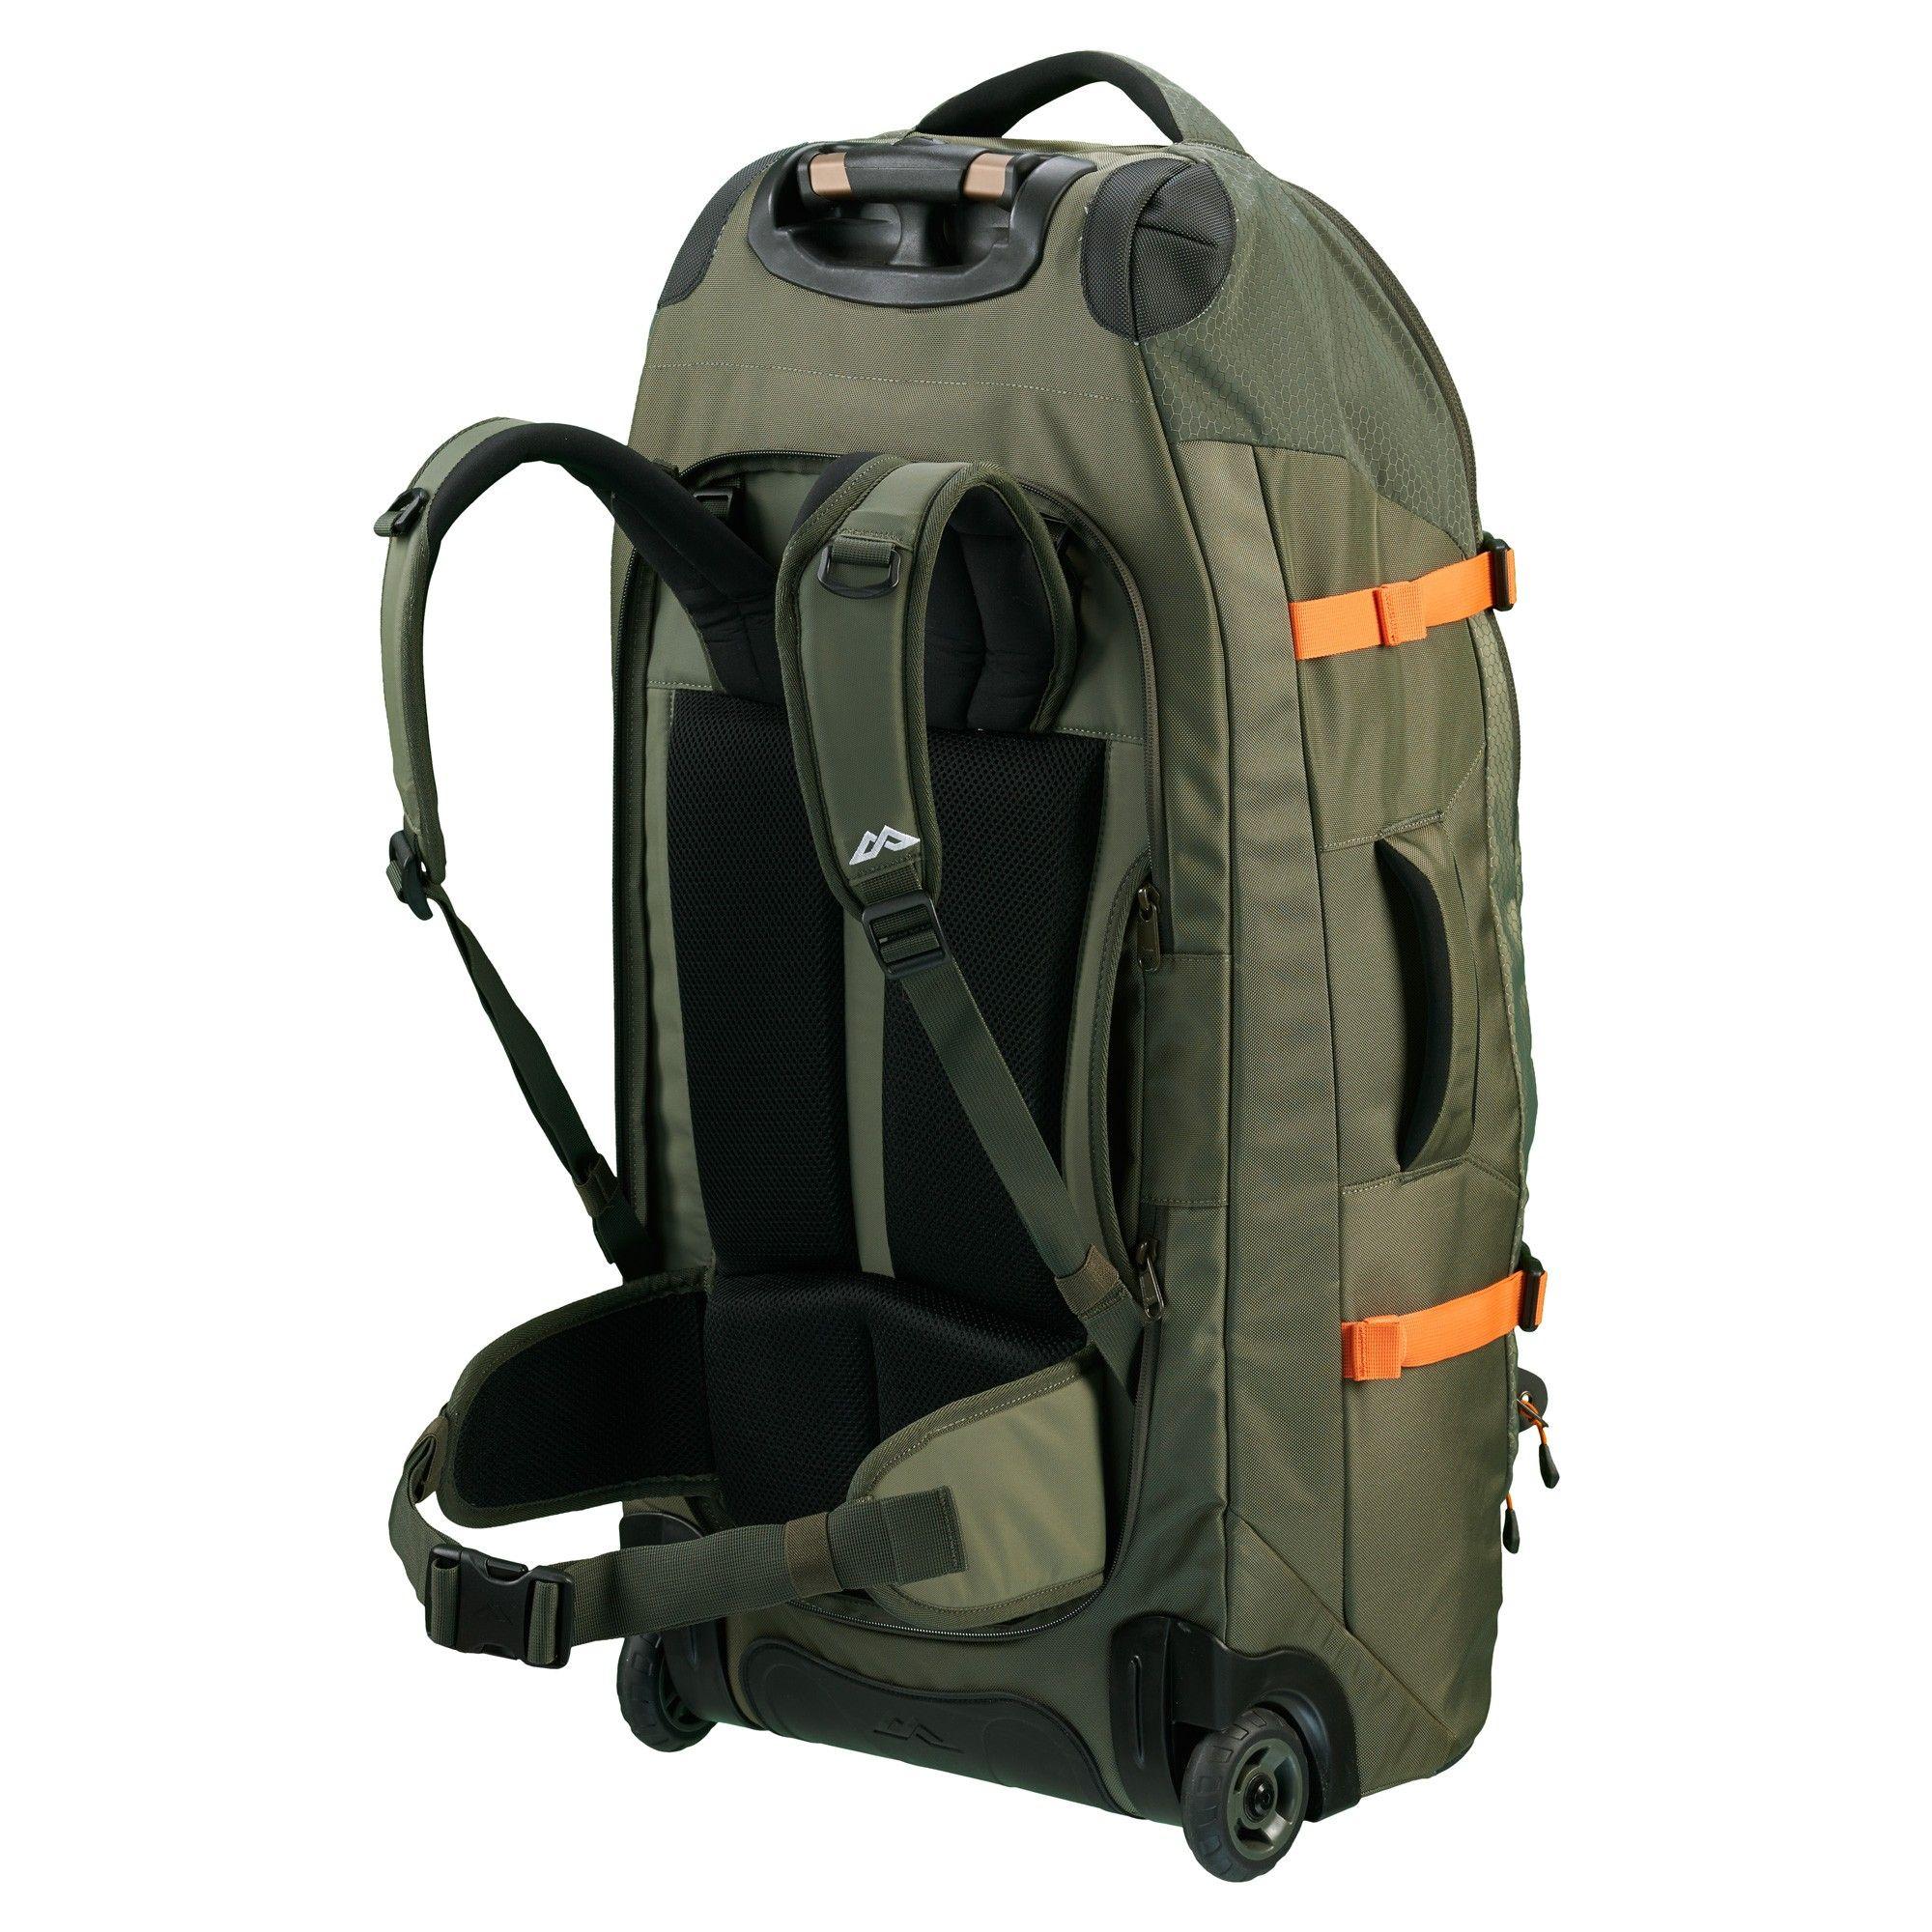 980bd19c7 Hybrid 70L Backpack Harness Wheeled Luggage Trolley v3 - Conifer ...